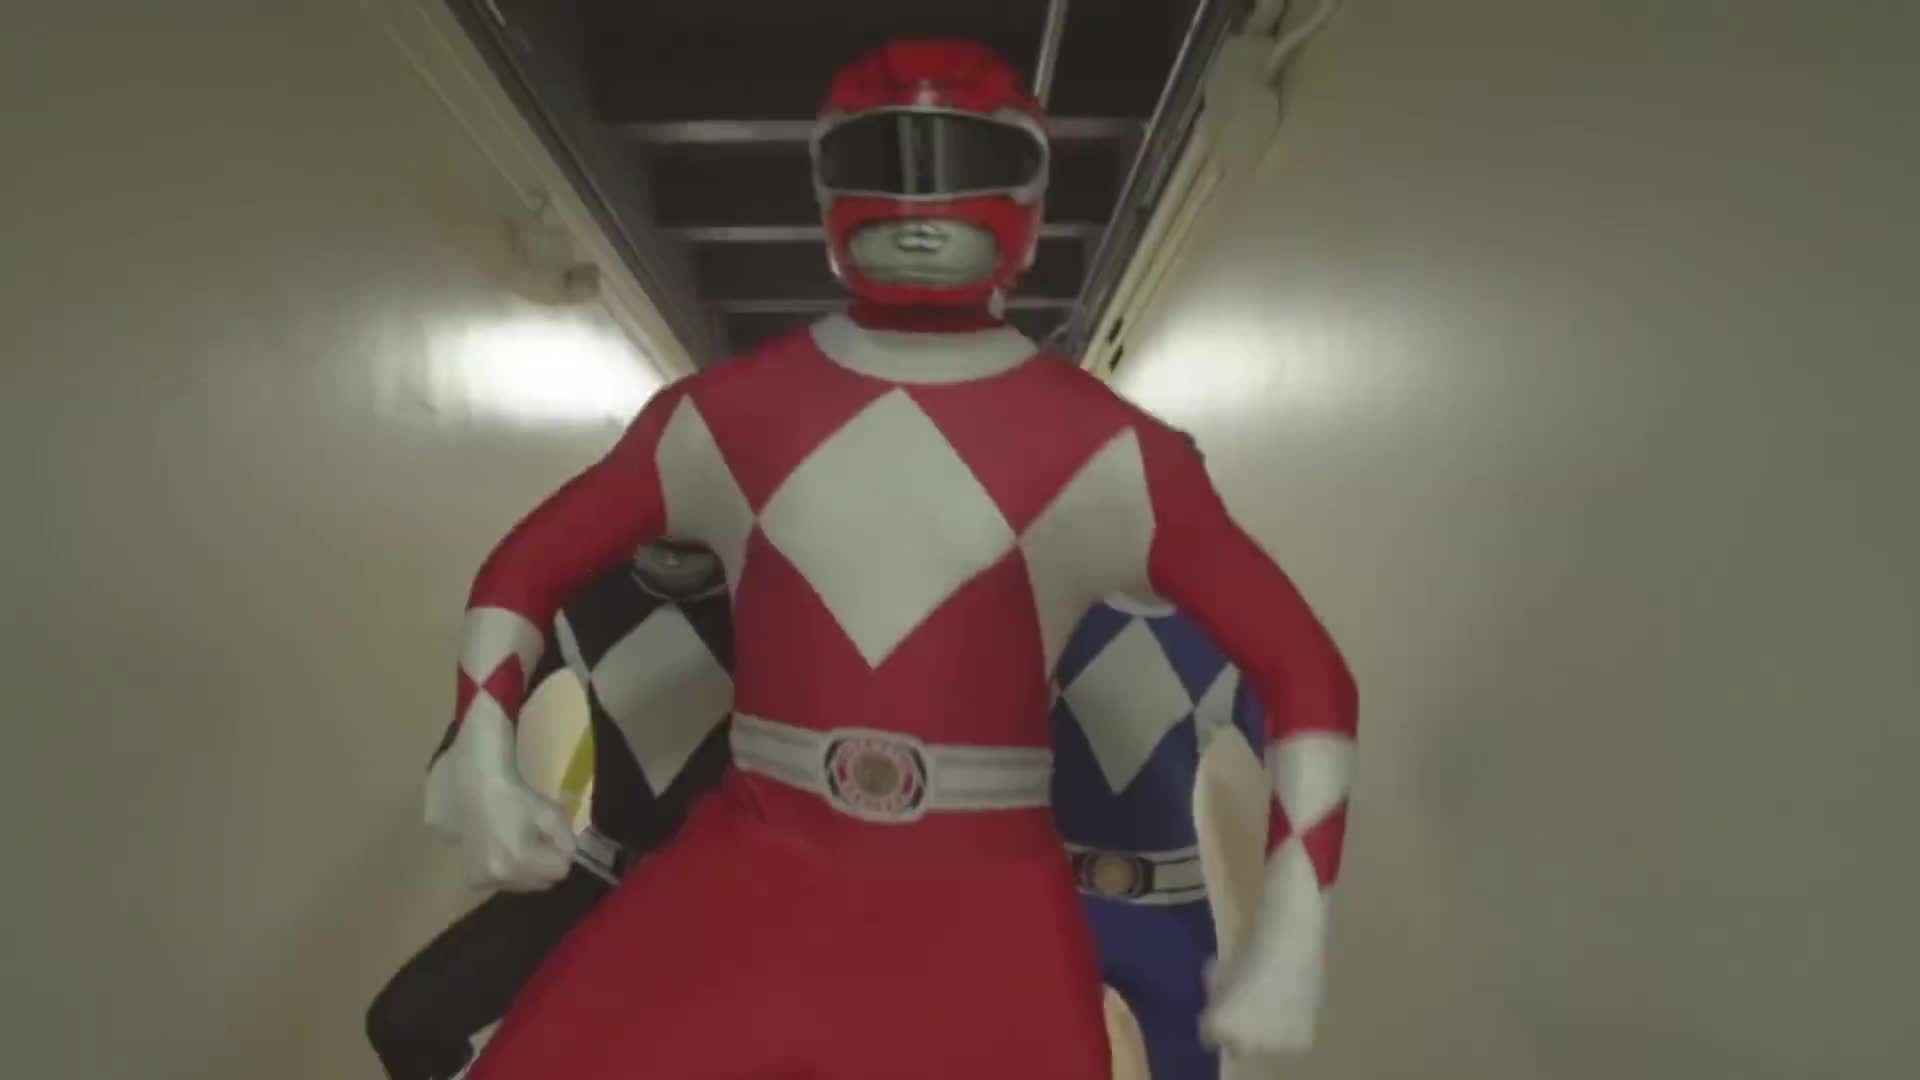 mighty morphin power rangers, power rangers, Power Rangers Hall Chase GIFs